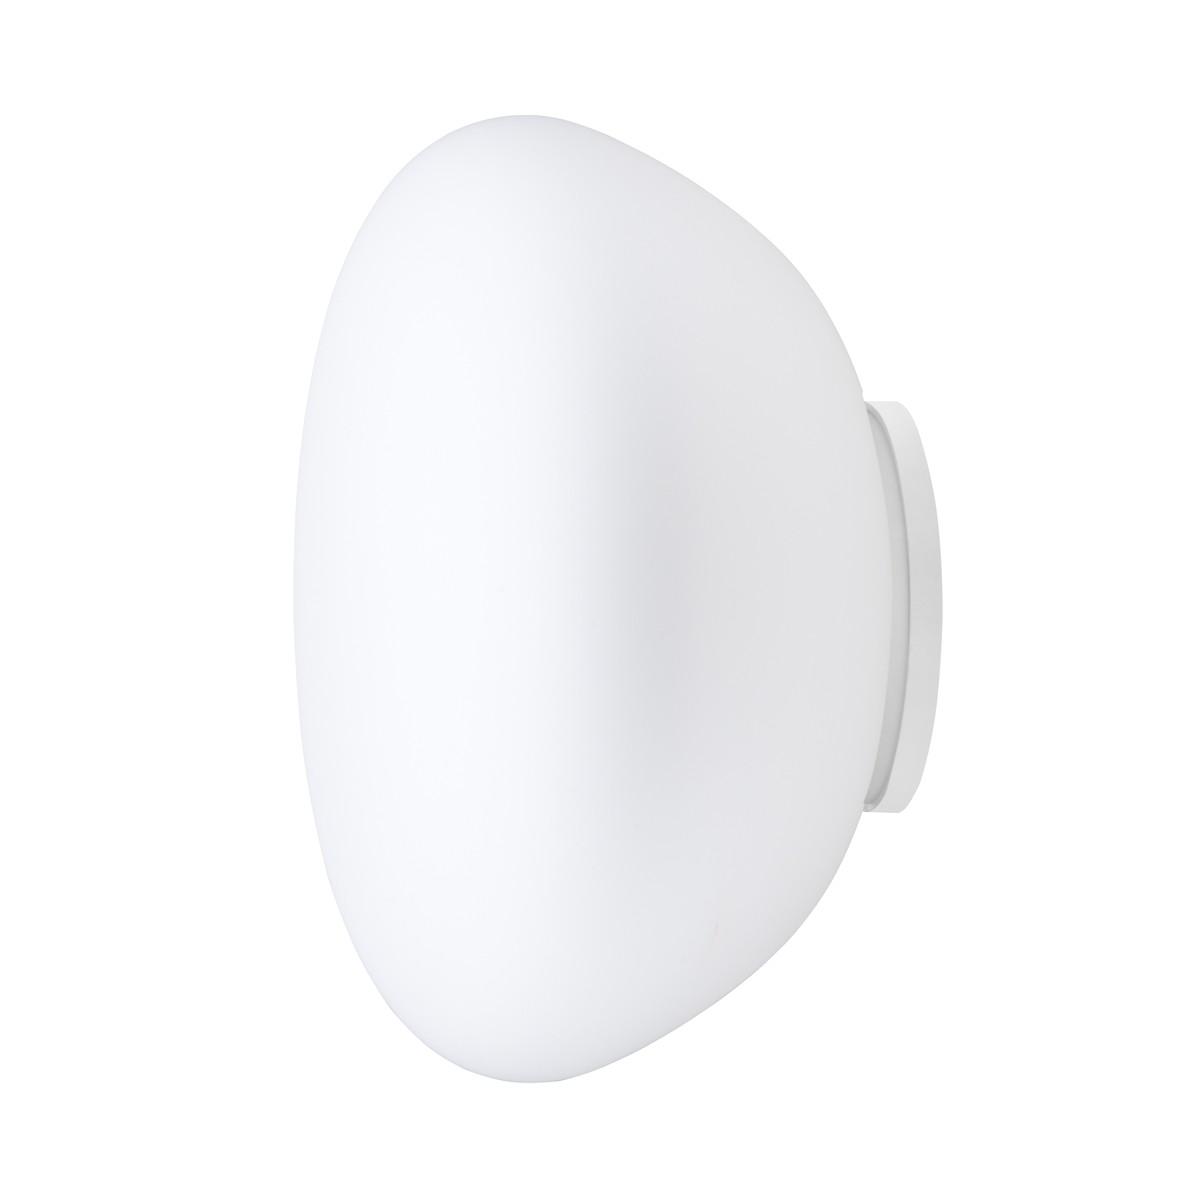 Fabbian Lumi Poga Wand-/Deckenleuchte, weiß, Fassung: LED, 3000° K